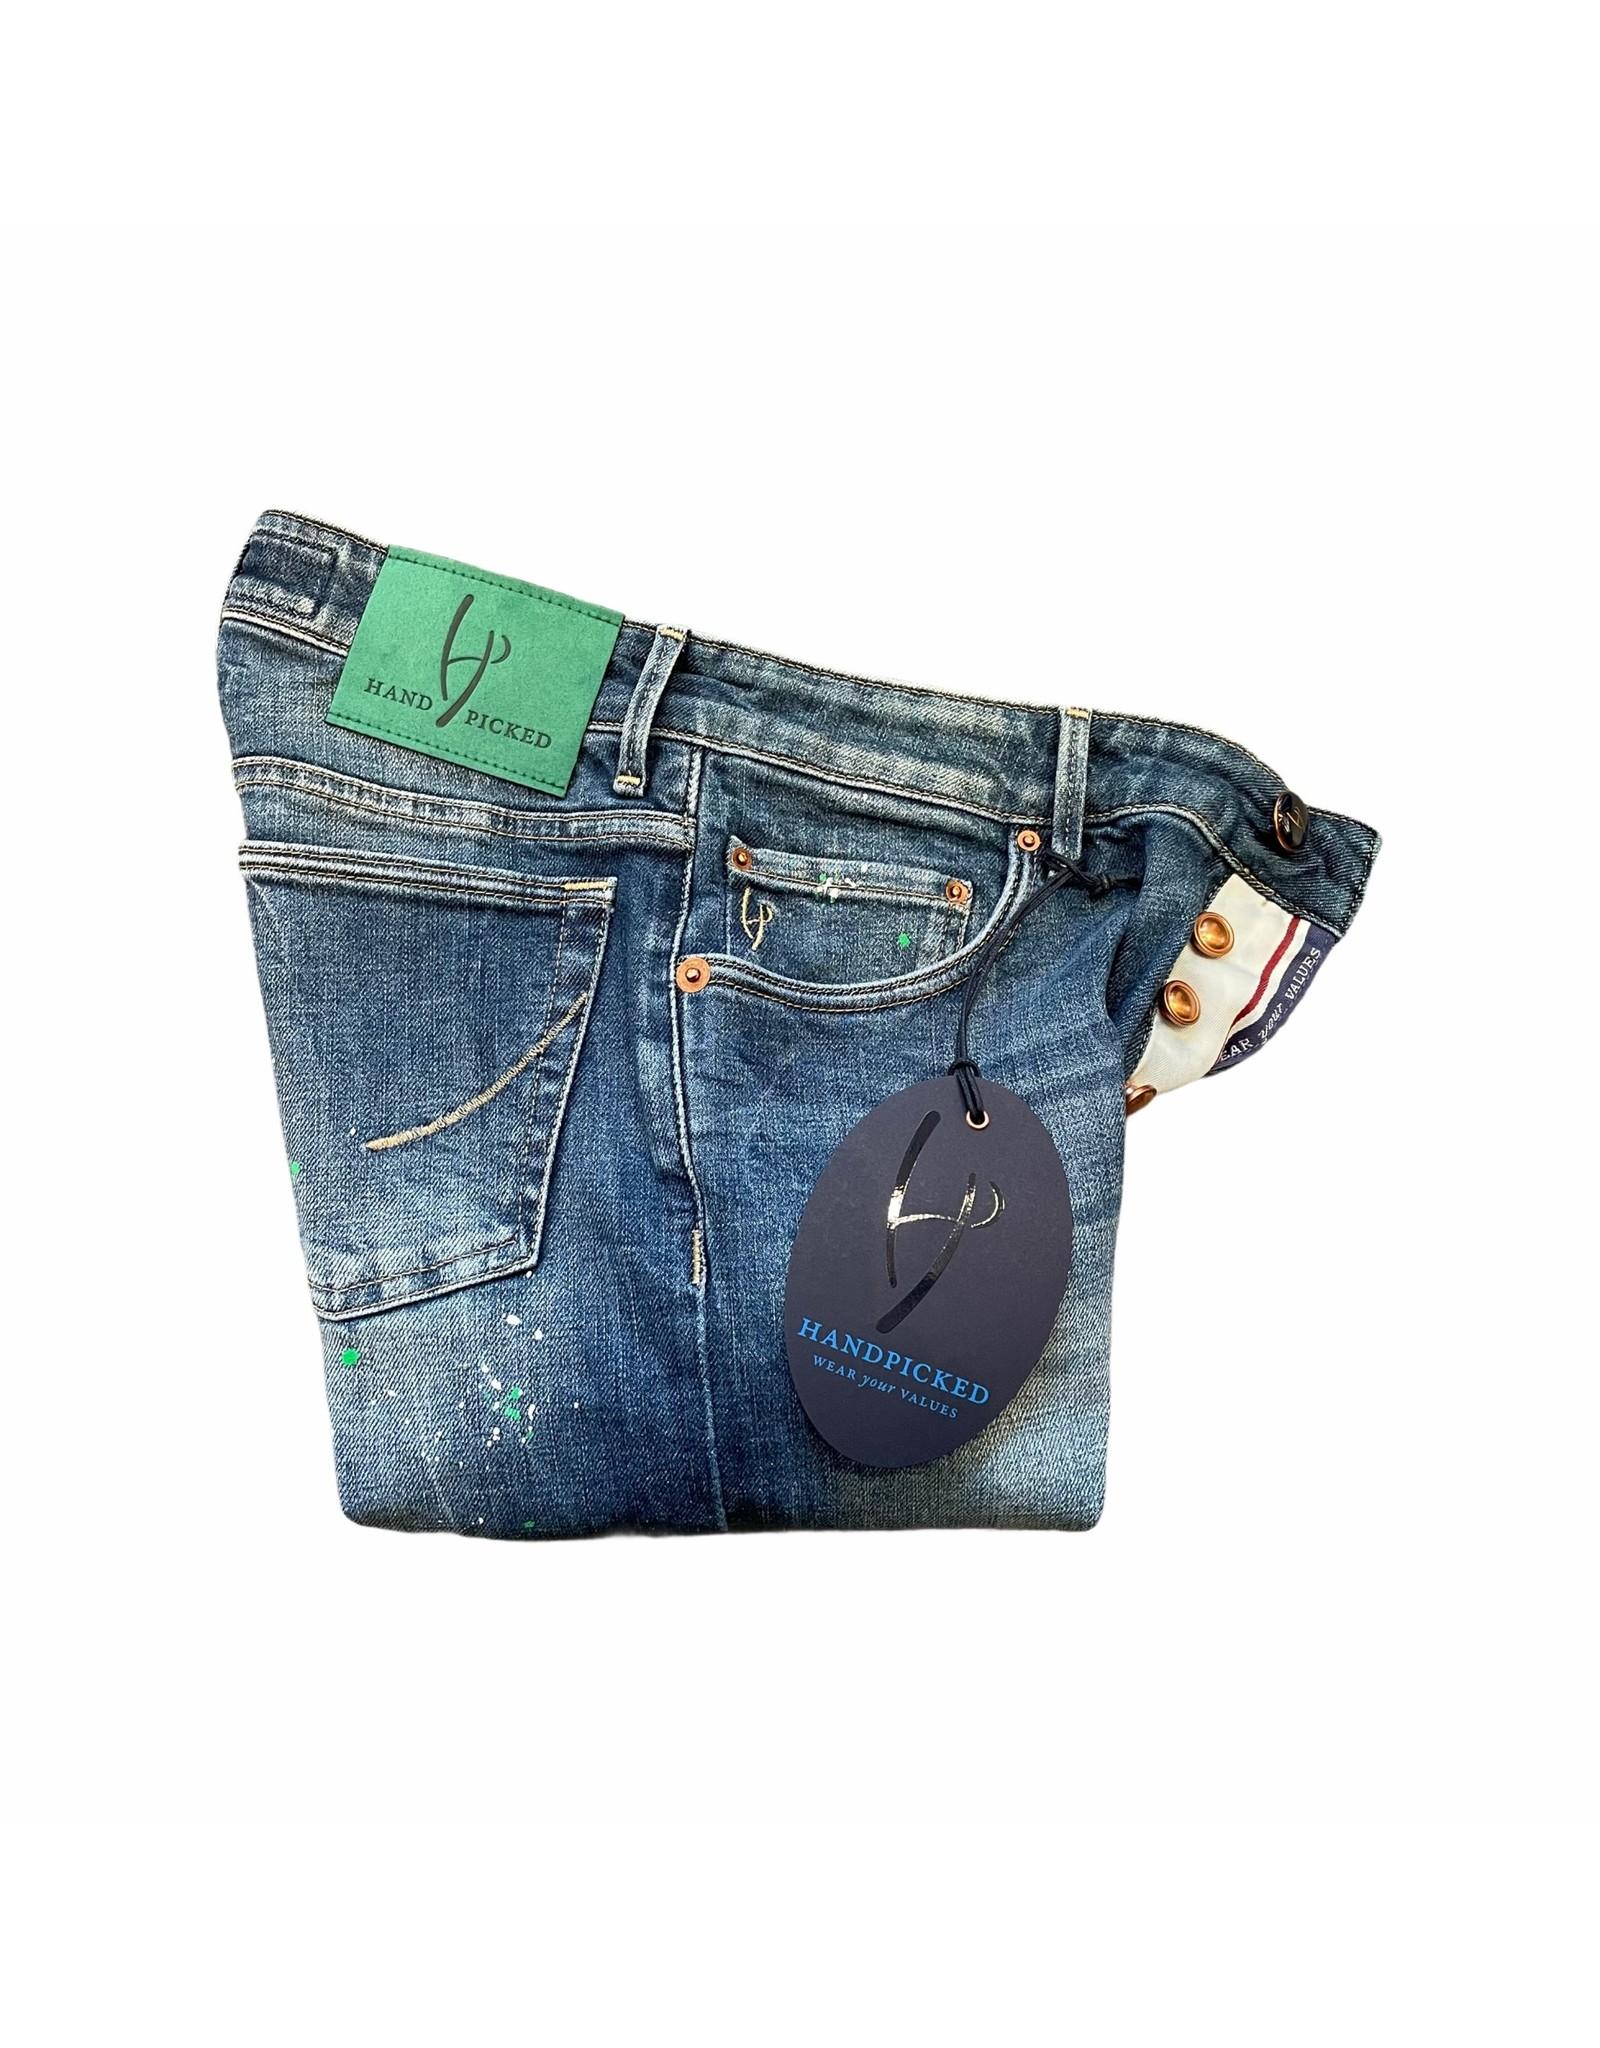 Hand Picked 21/1 Hand Picked  Jeans ORVIETO-C  02309 W2